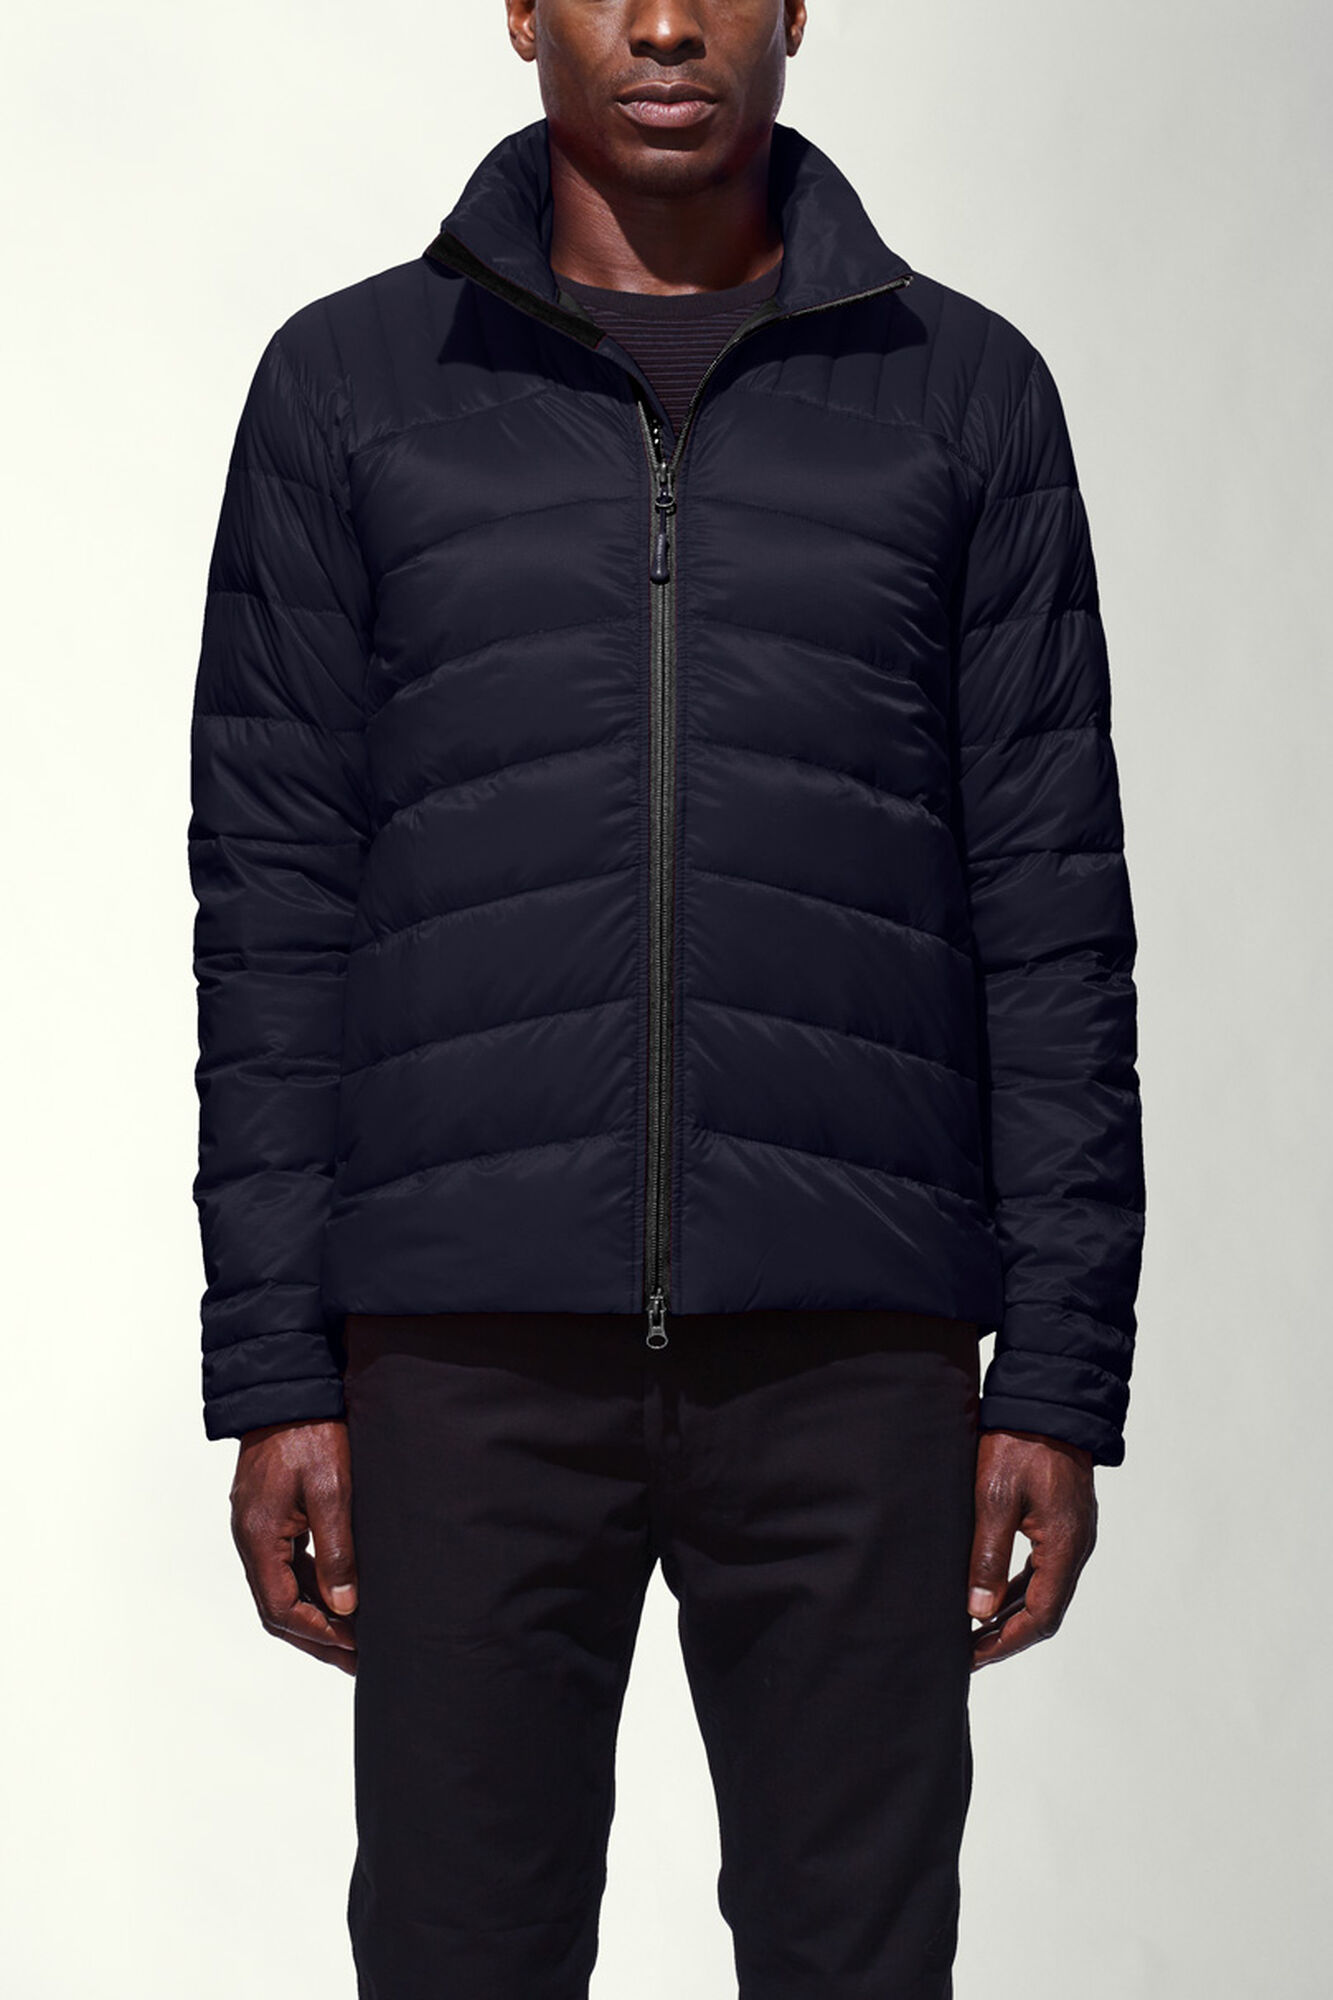 Men's Parkas, Jackets & Accessories   Canada Goose®